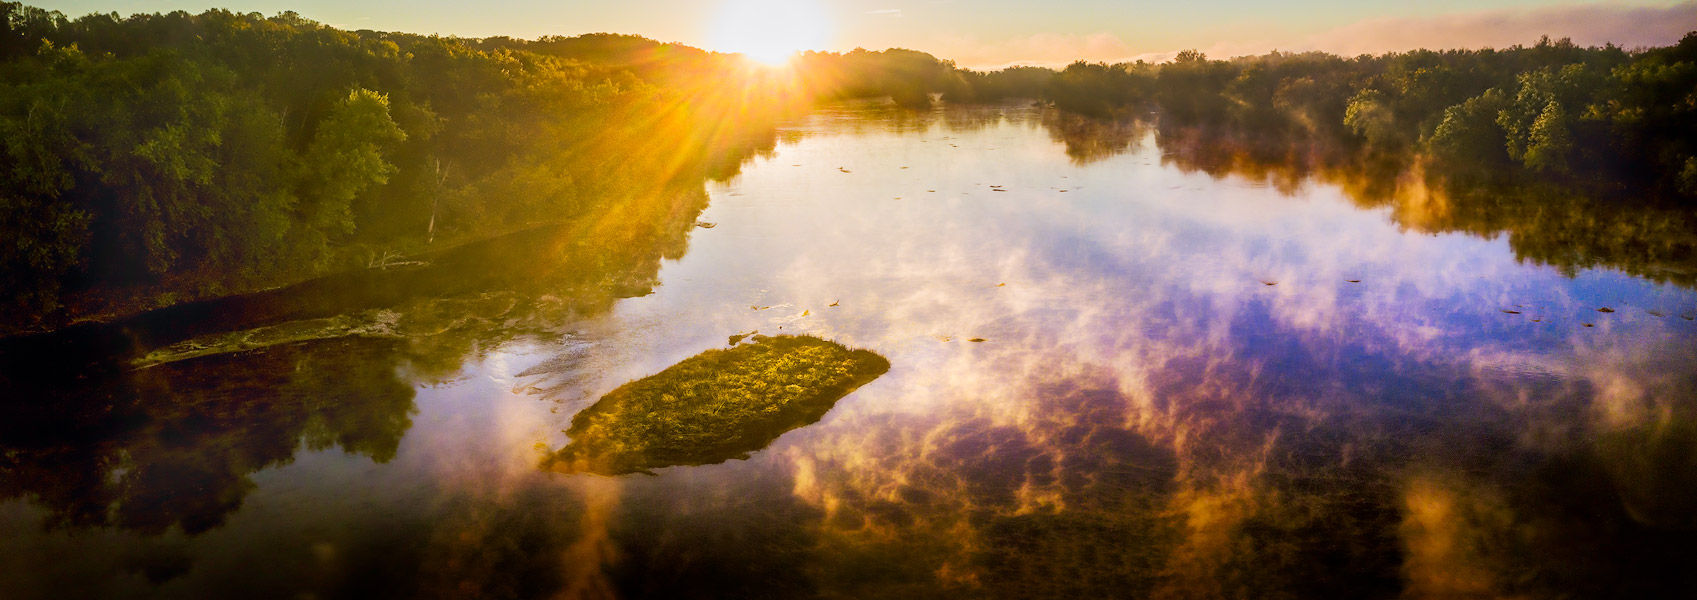 Potomac River, Sunrise, Pennyfield Lock